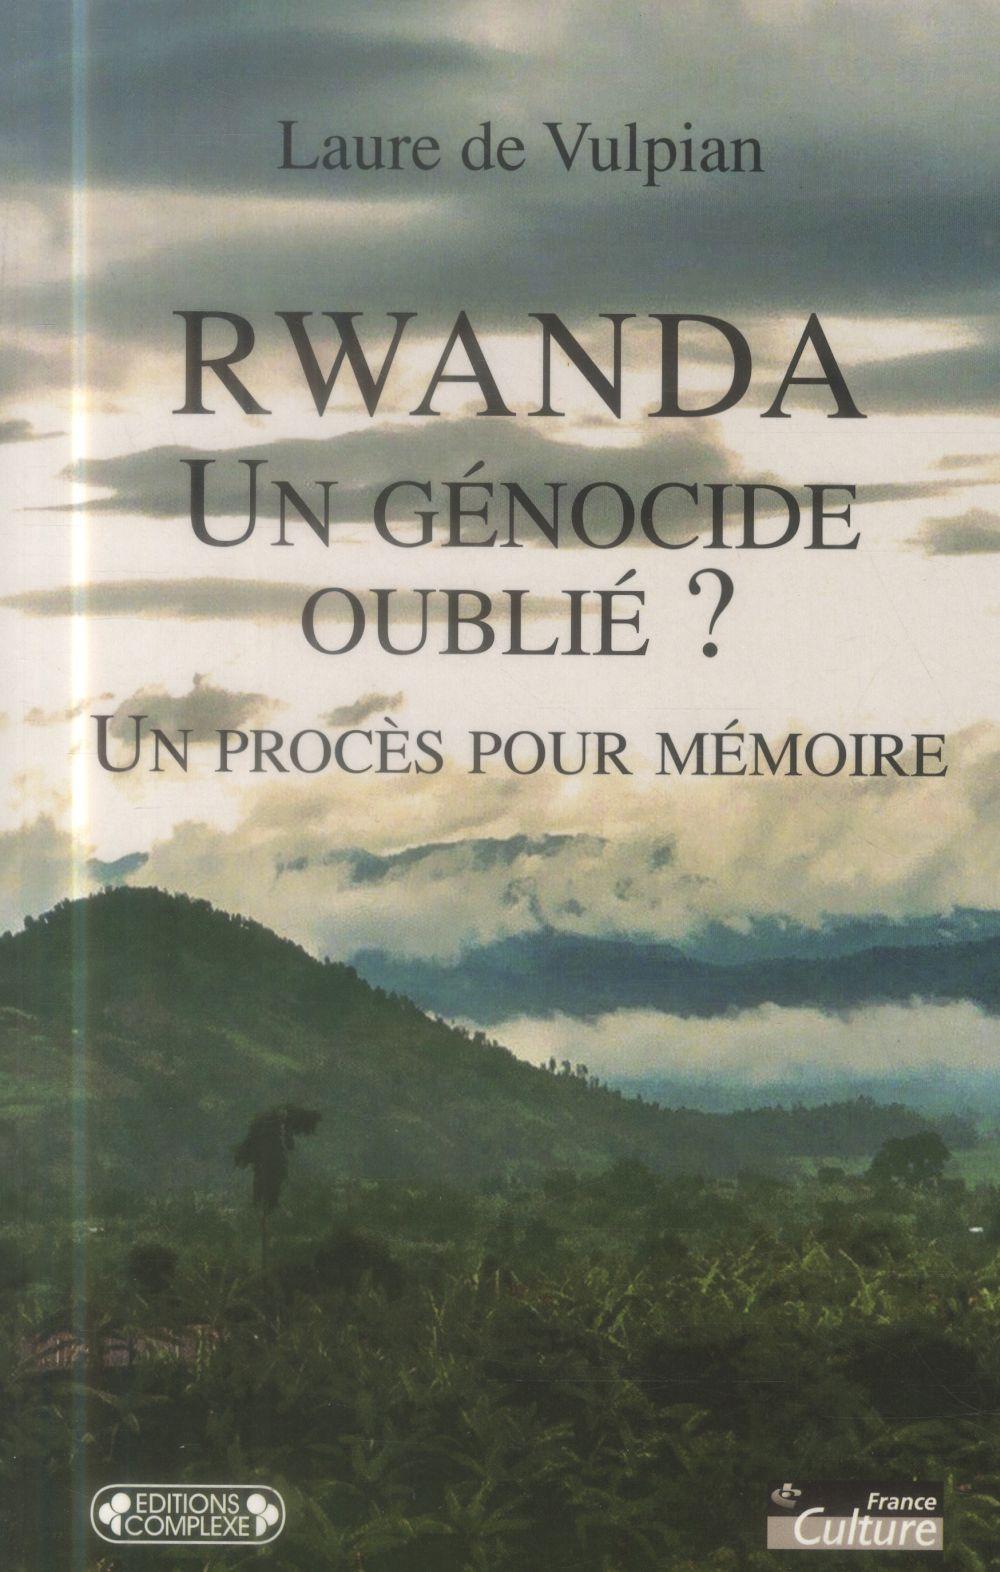 Rwanda un genocide oublie ?